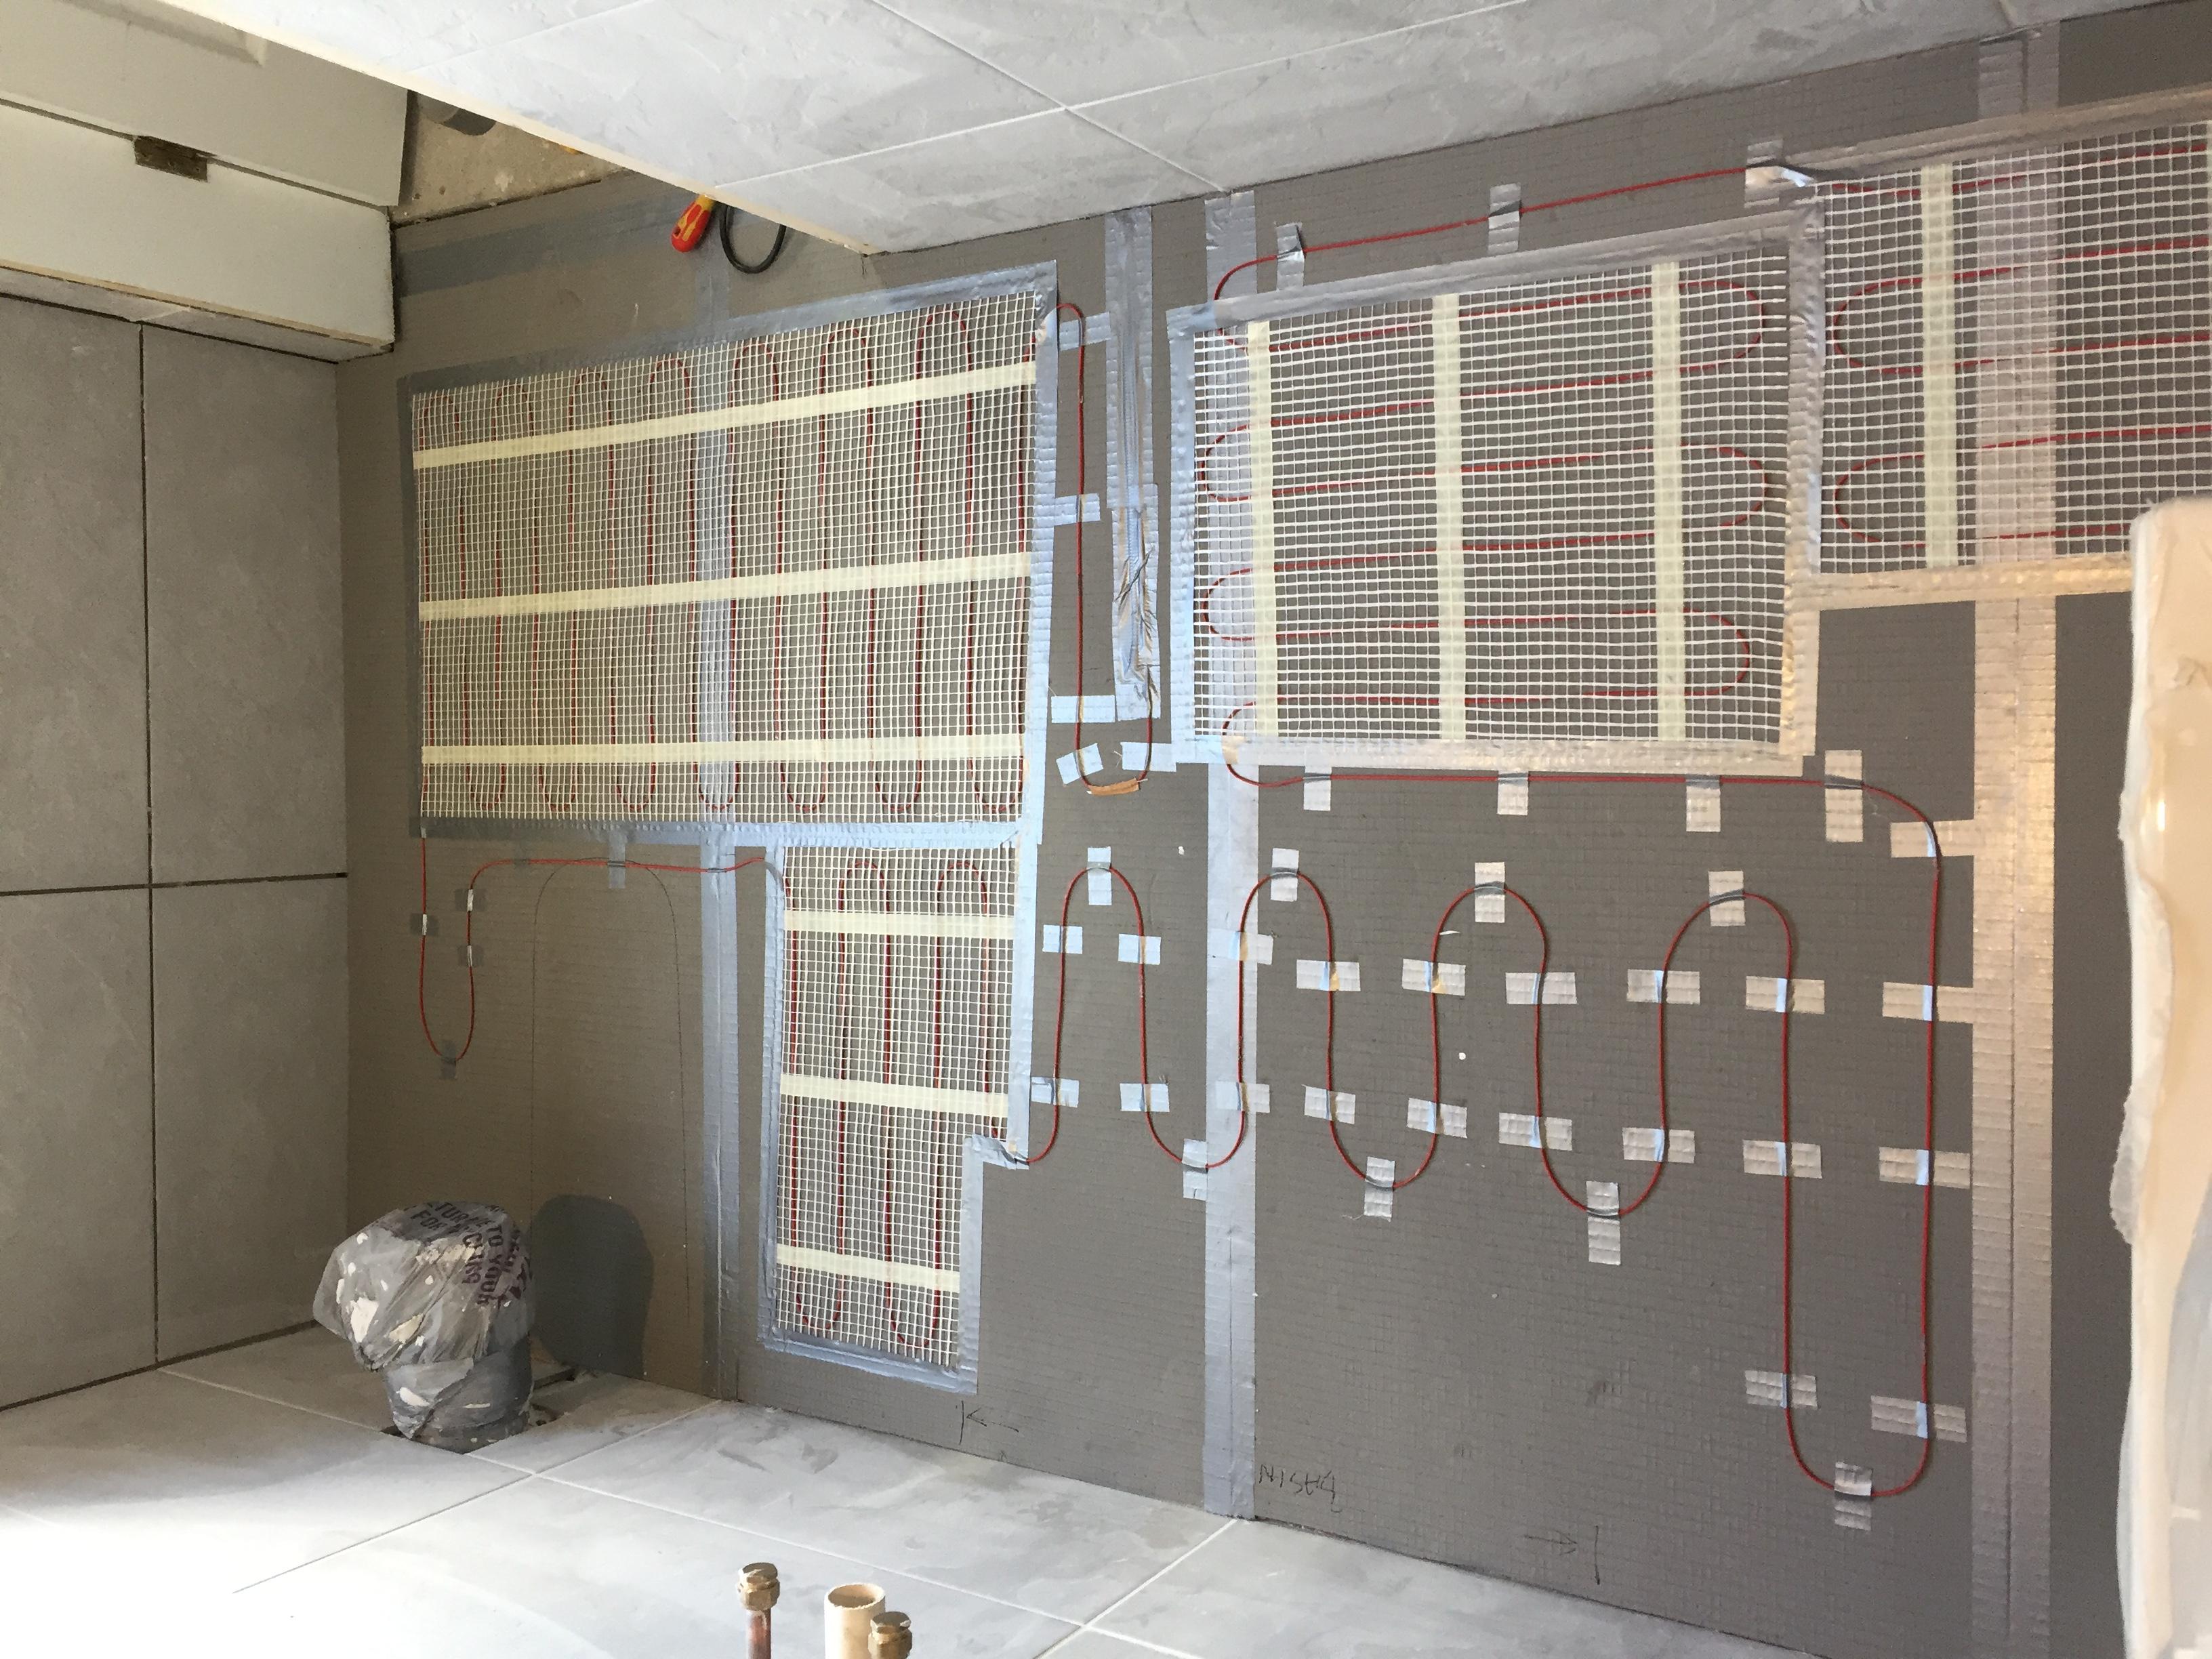 Benchmark Electrical Contractors Ltd